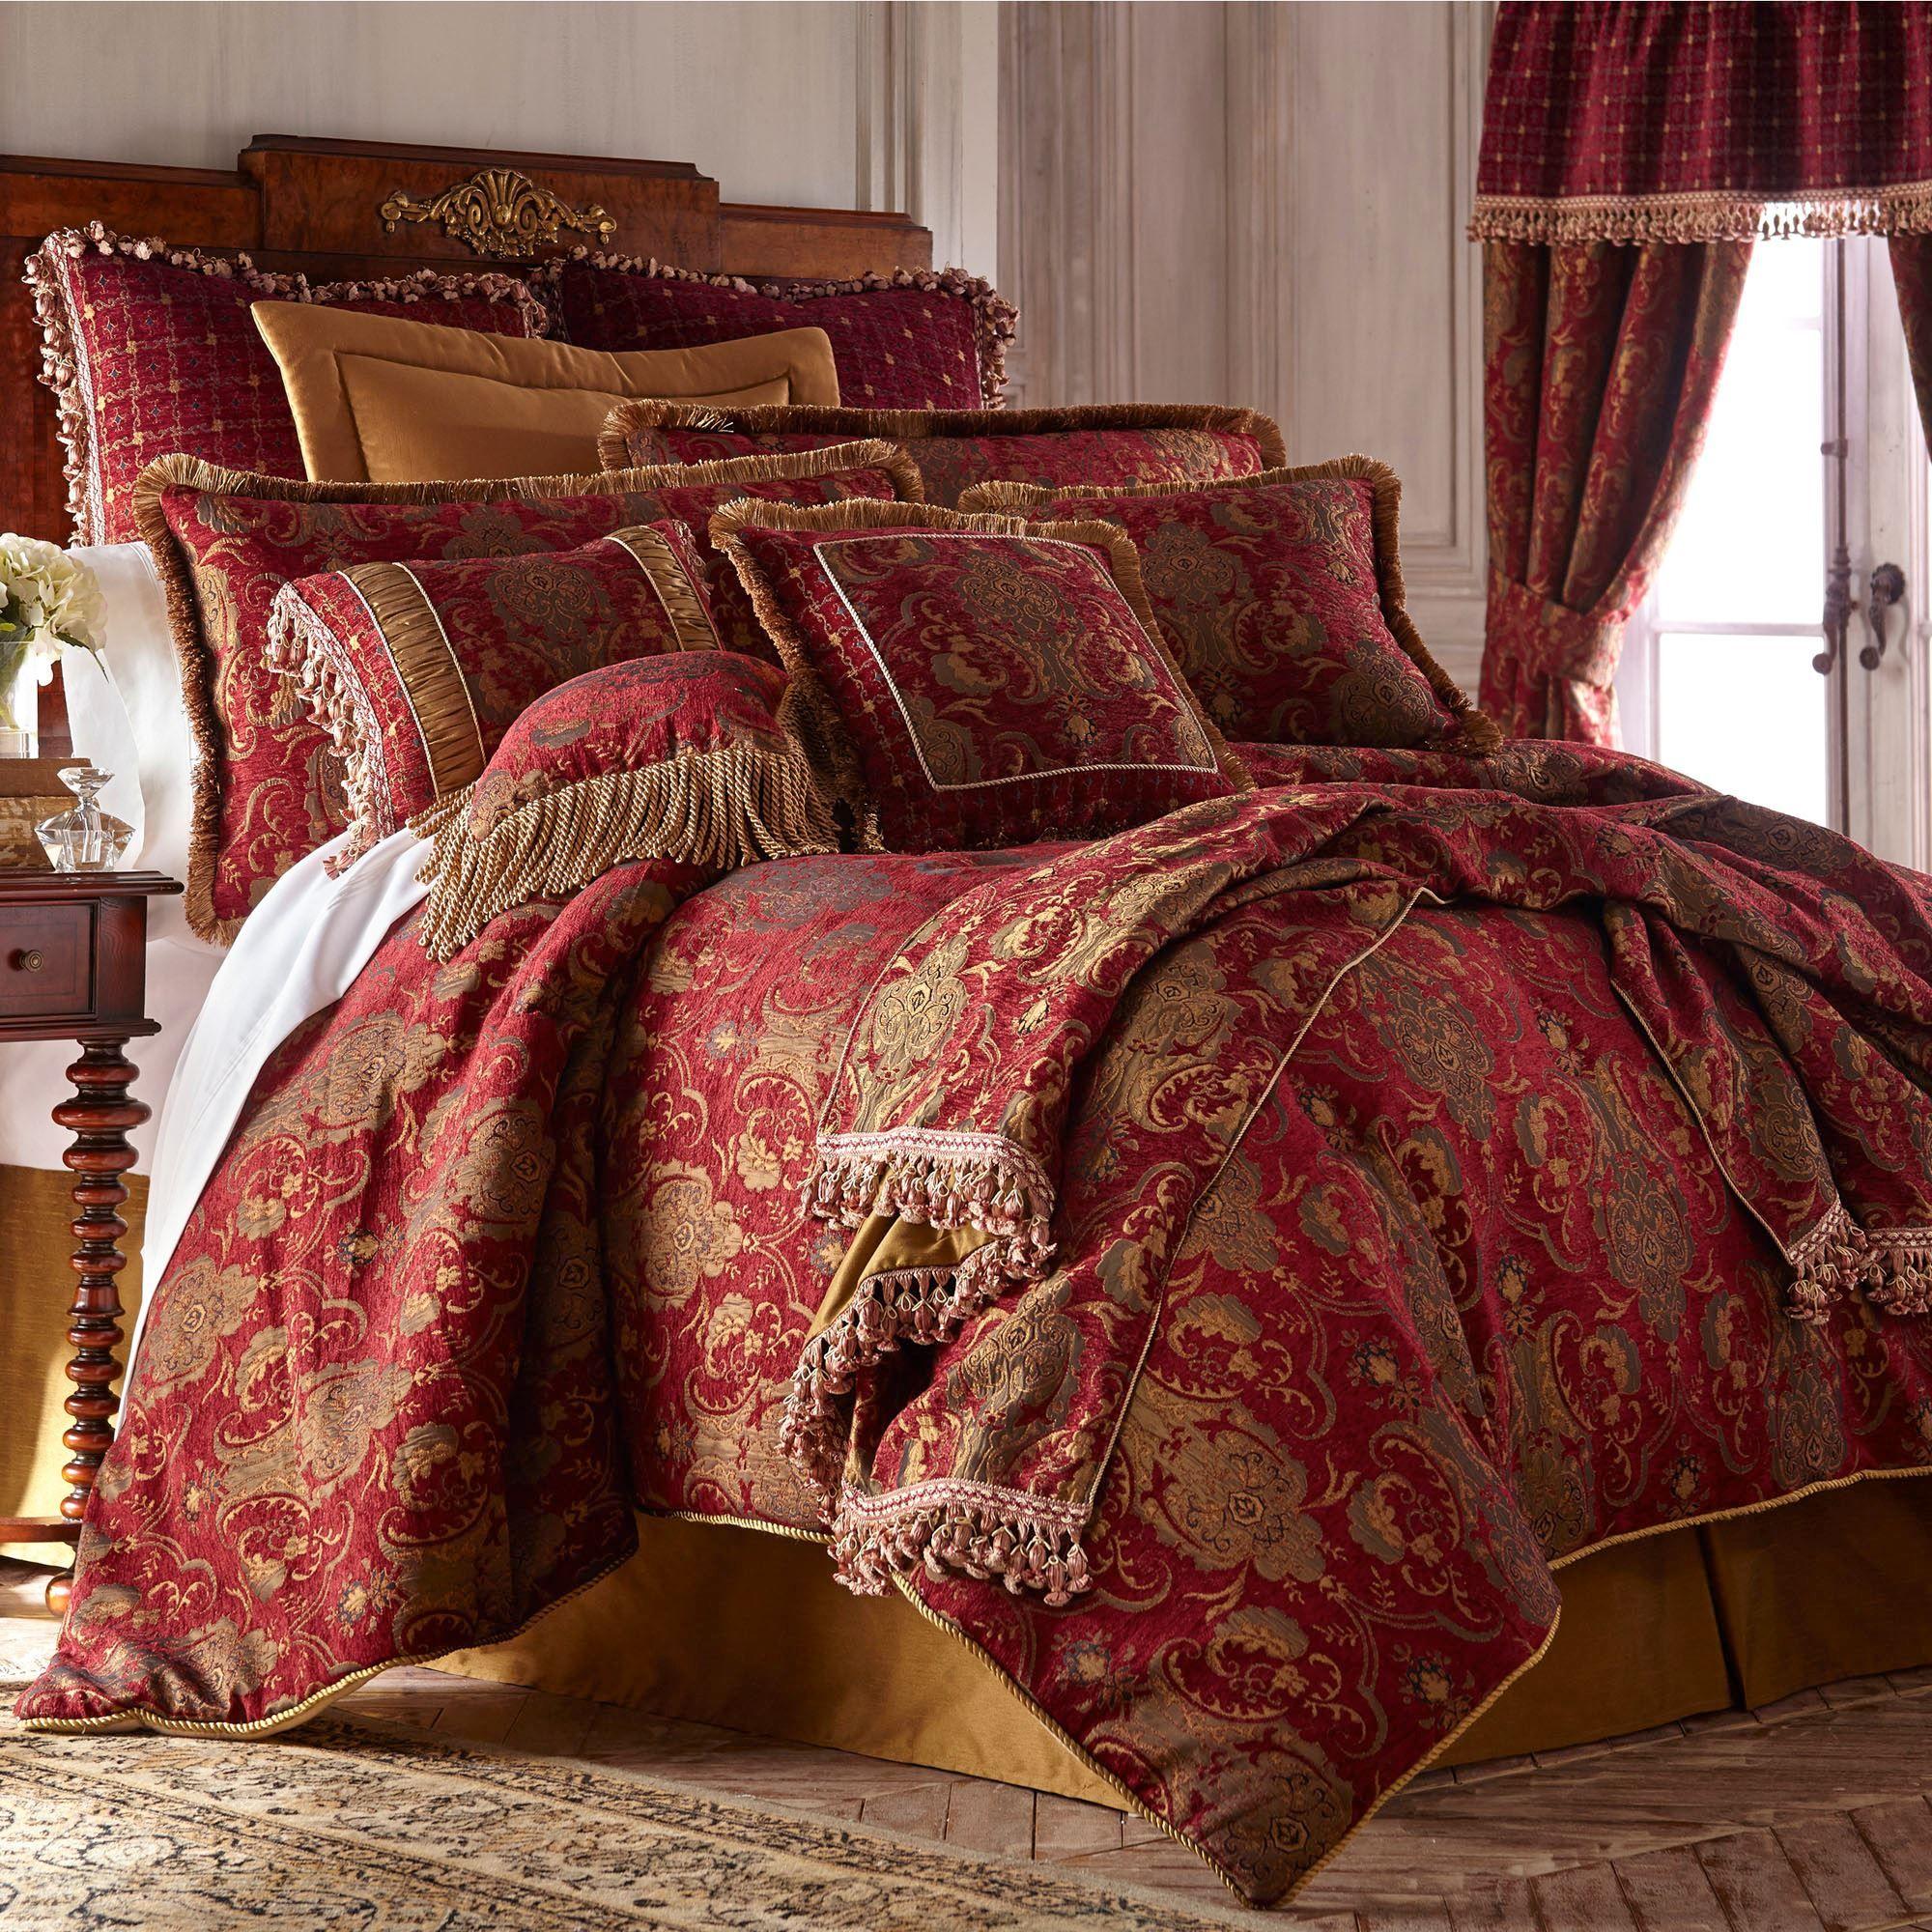 China Art Ruby Red Asian Inspired Comforter Bedding Comforter